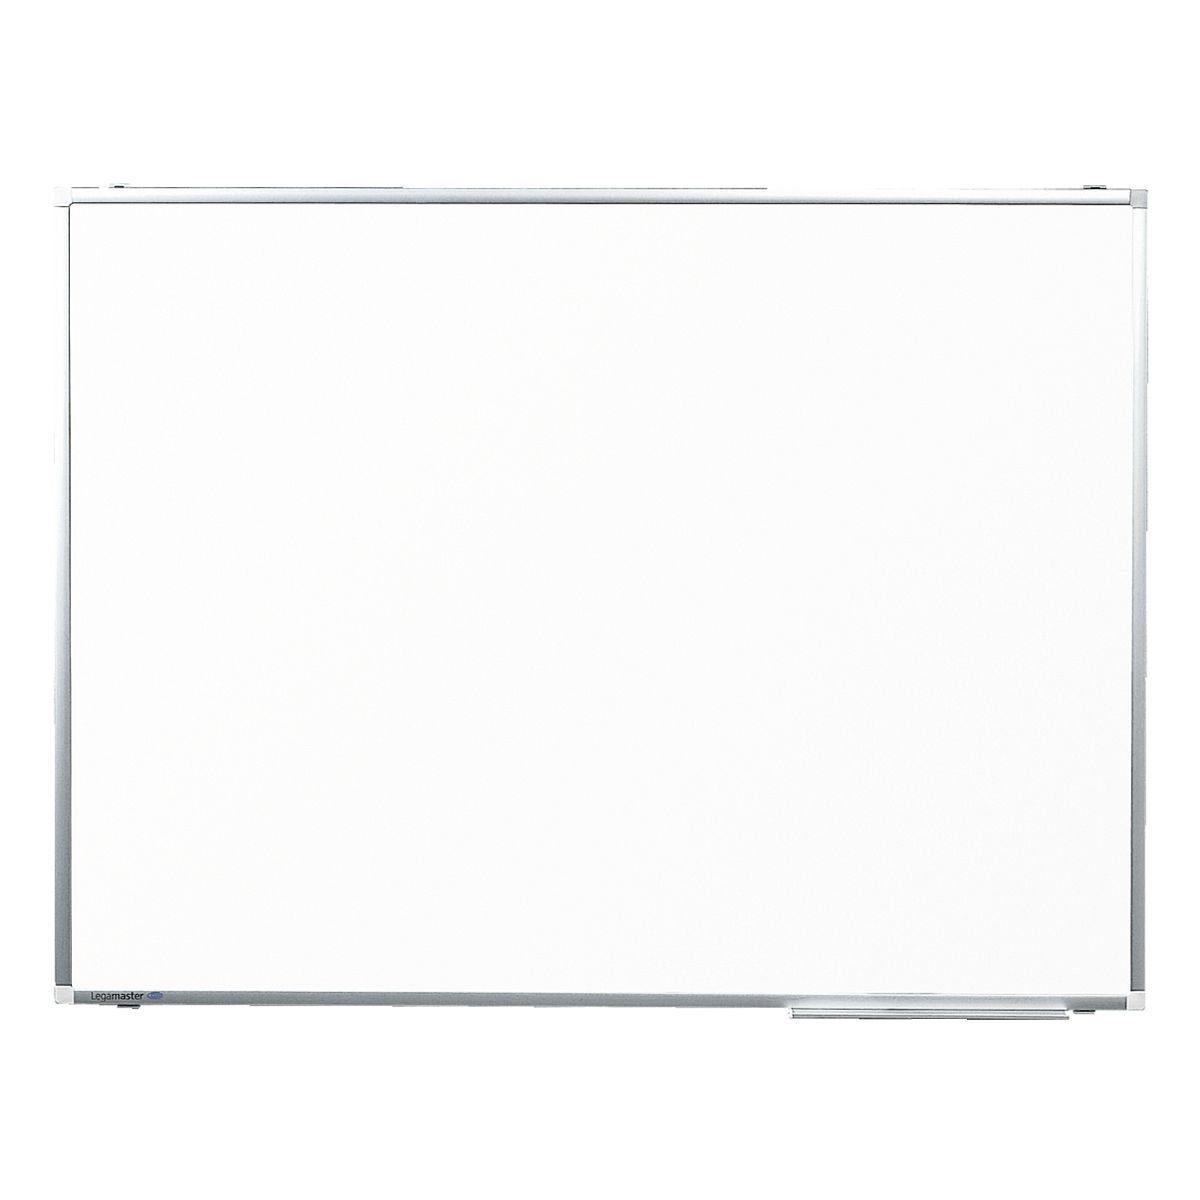 LEGAMASTER Whiteboard 7-P101054 emailliert, 120 x 90 cm